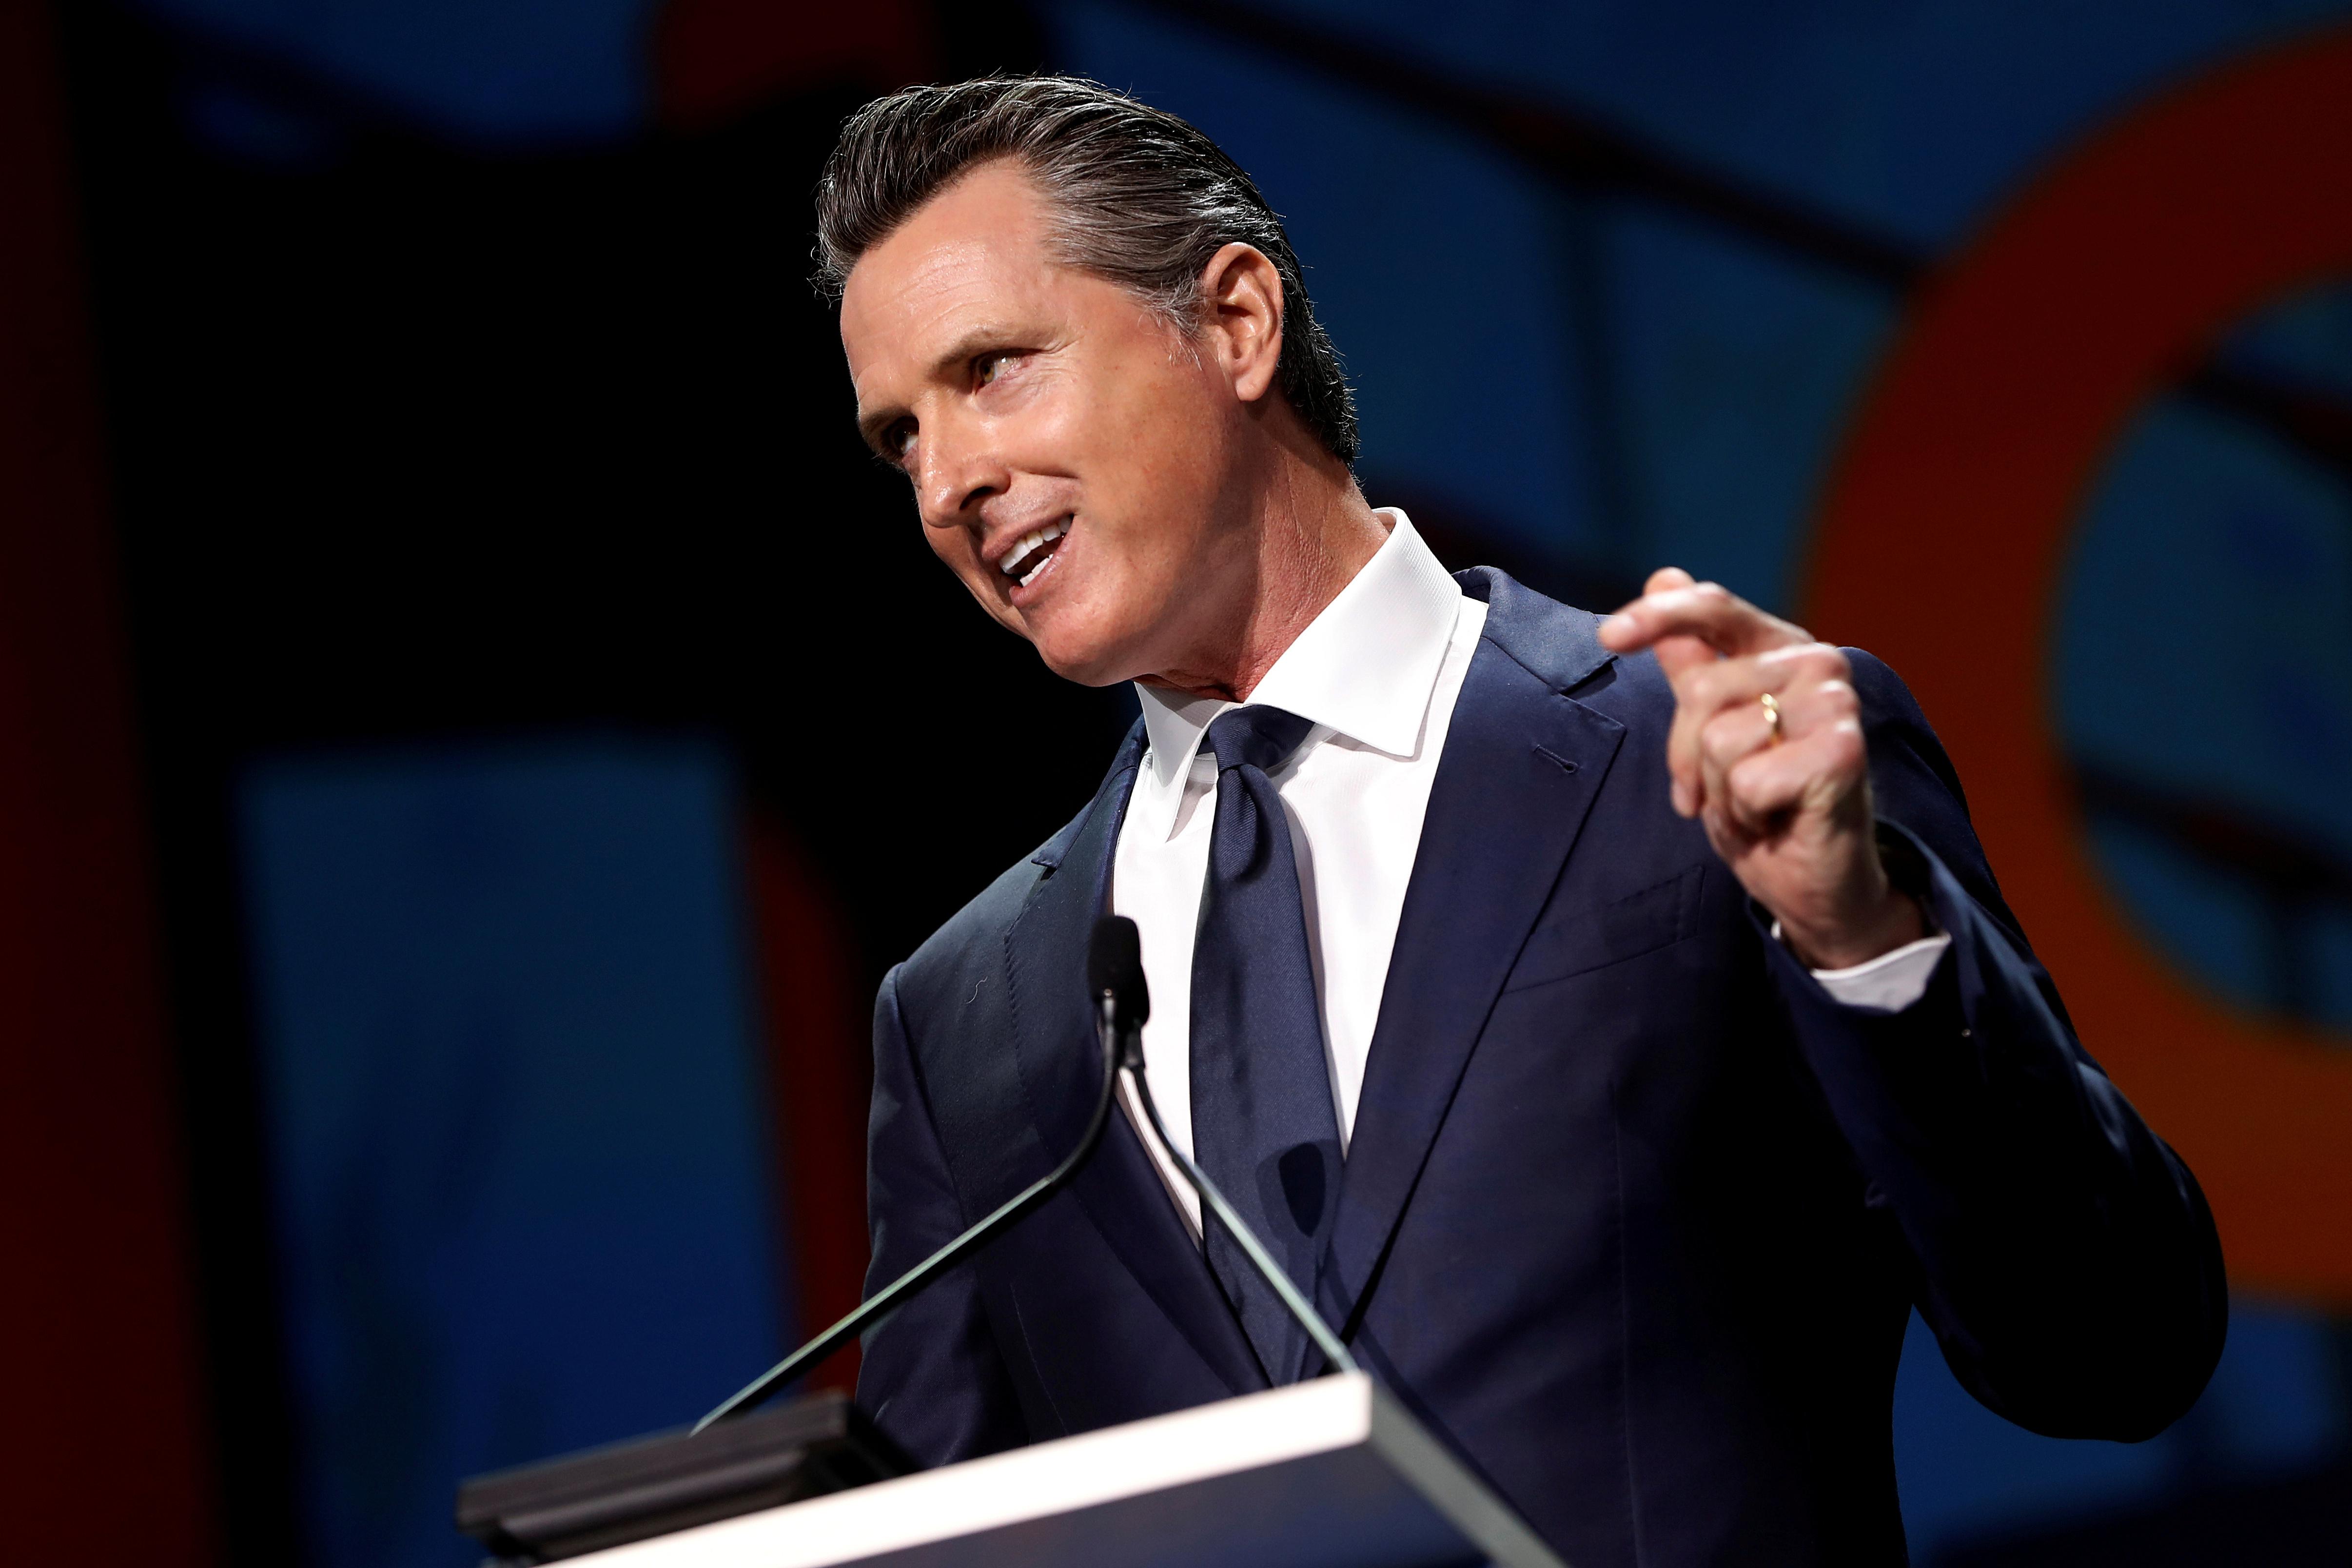 California's Gov. Gavin Newsom speaks during the California Democratic Convention in San Francisco, California, U.S., June 1, 2019. REUTERS/Stephen Lam/File Photo